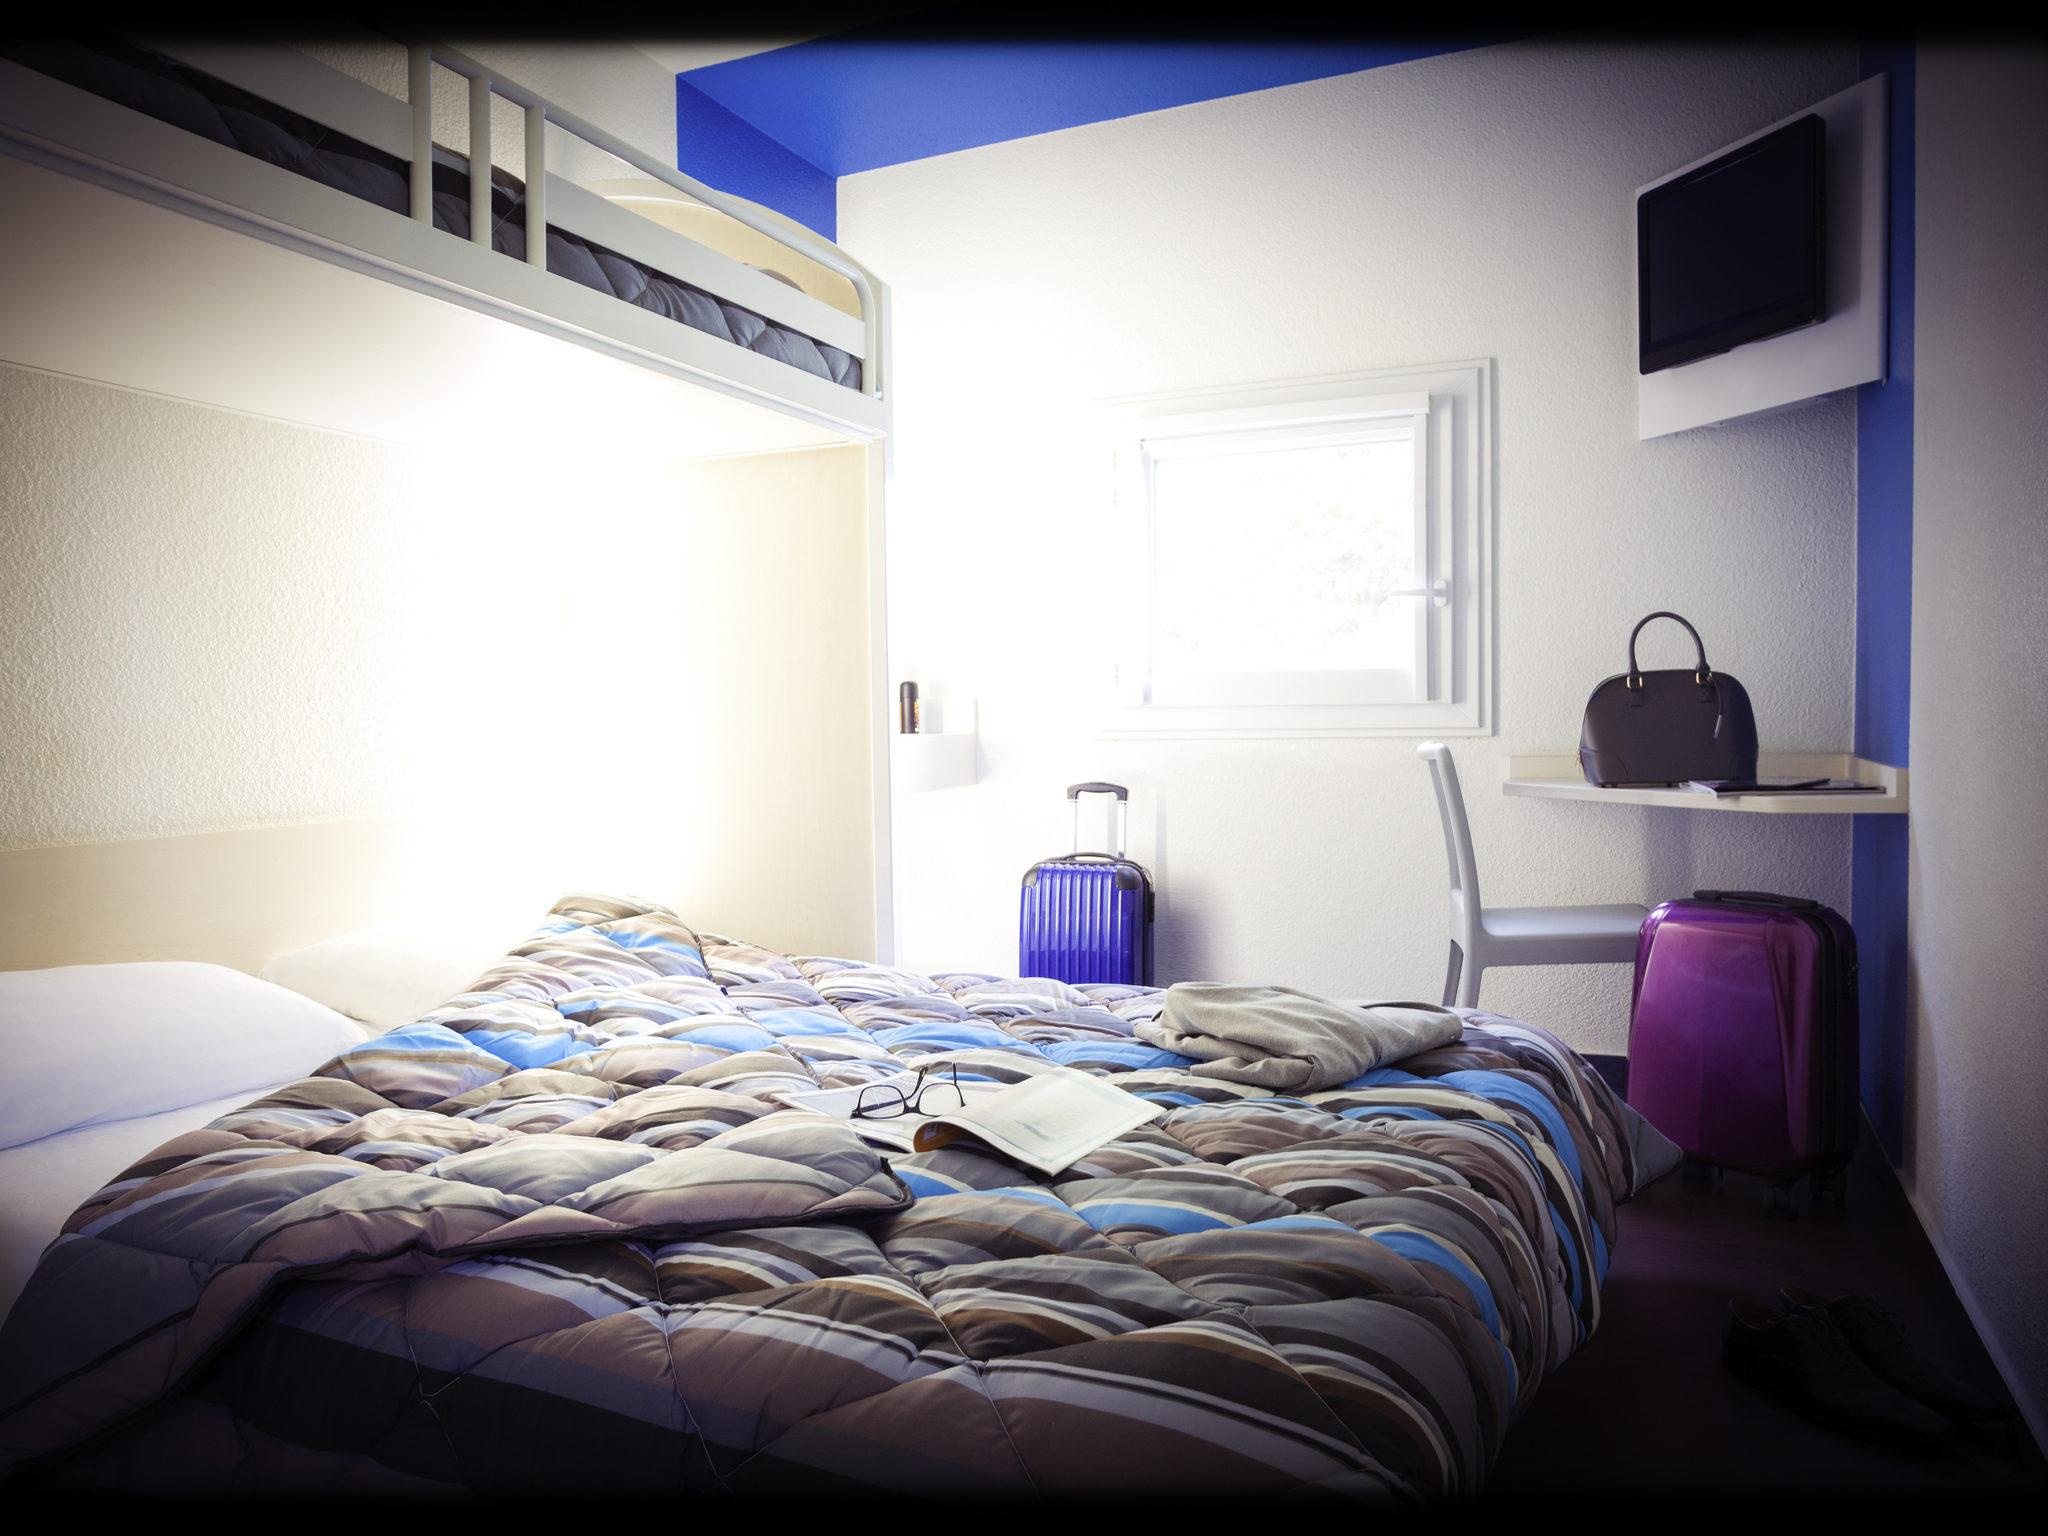 Отель — hotelF1 Dunkerque Grande-Synthe